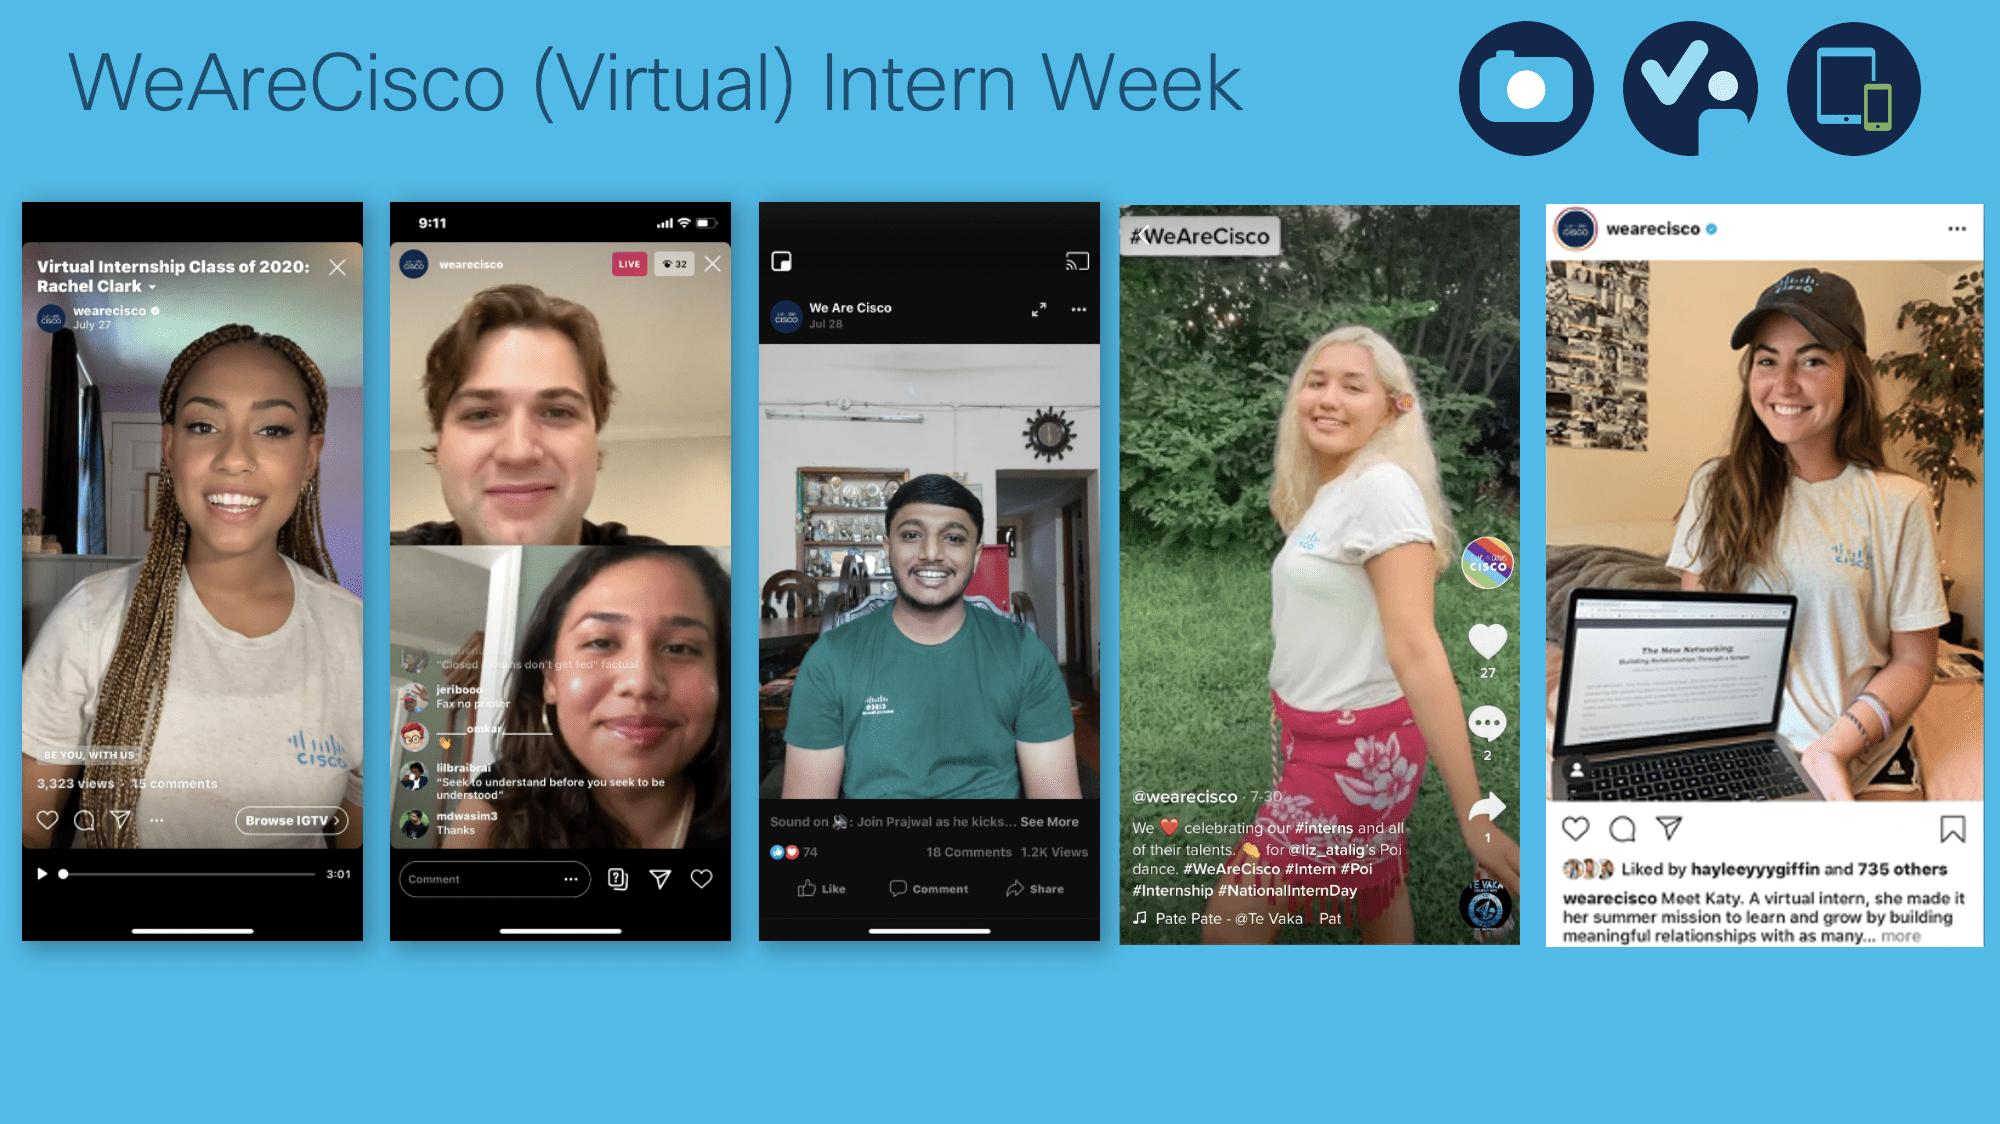 WeAreCisco (Virtual) Intern Week 2020 Campaign